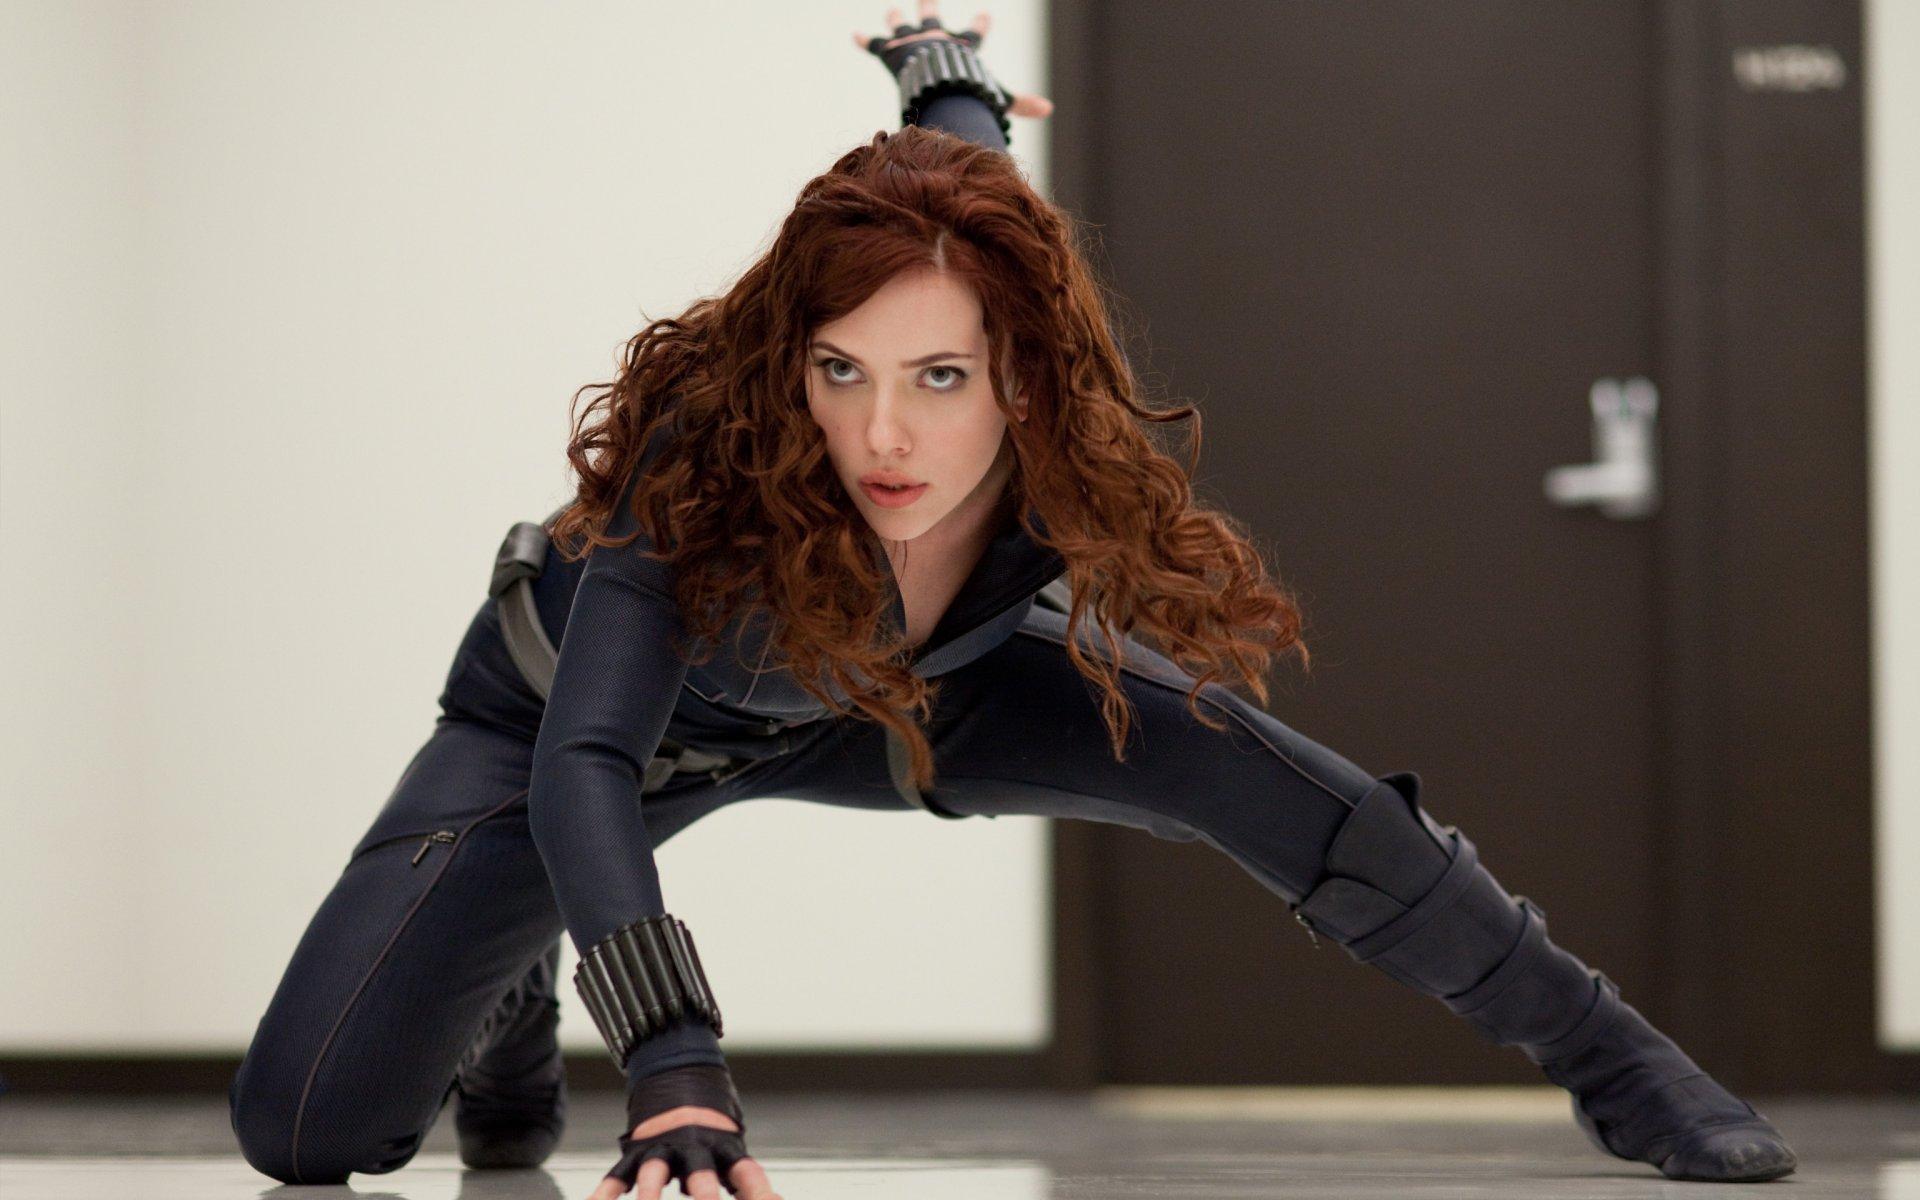 Black Widow Iron Man 2 Widescreen 壁紙 スカーレット